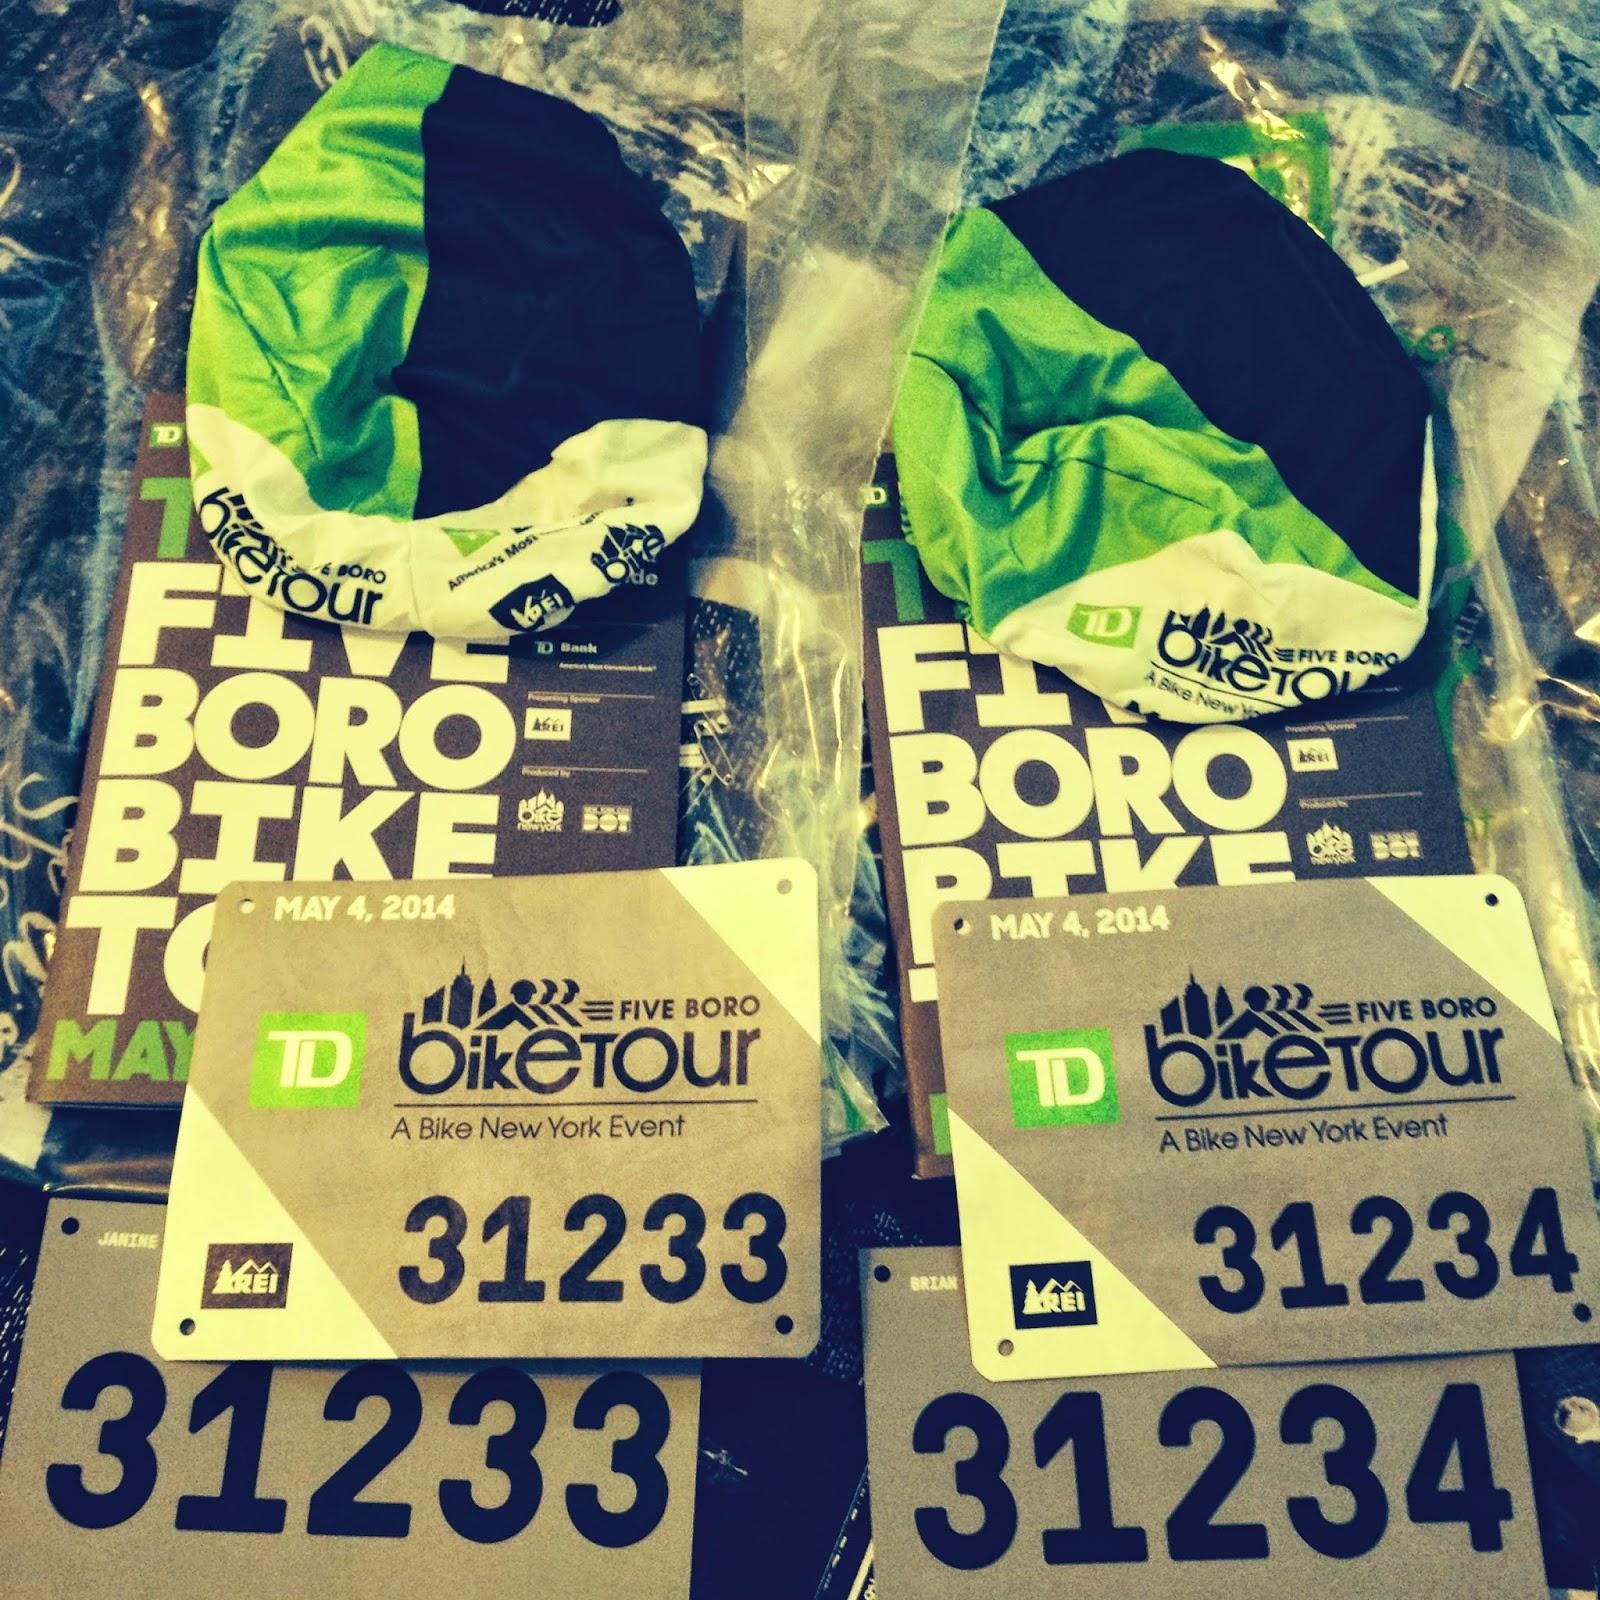 TD 5 boro bike tour 2014